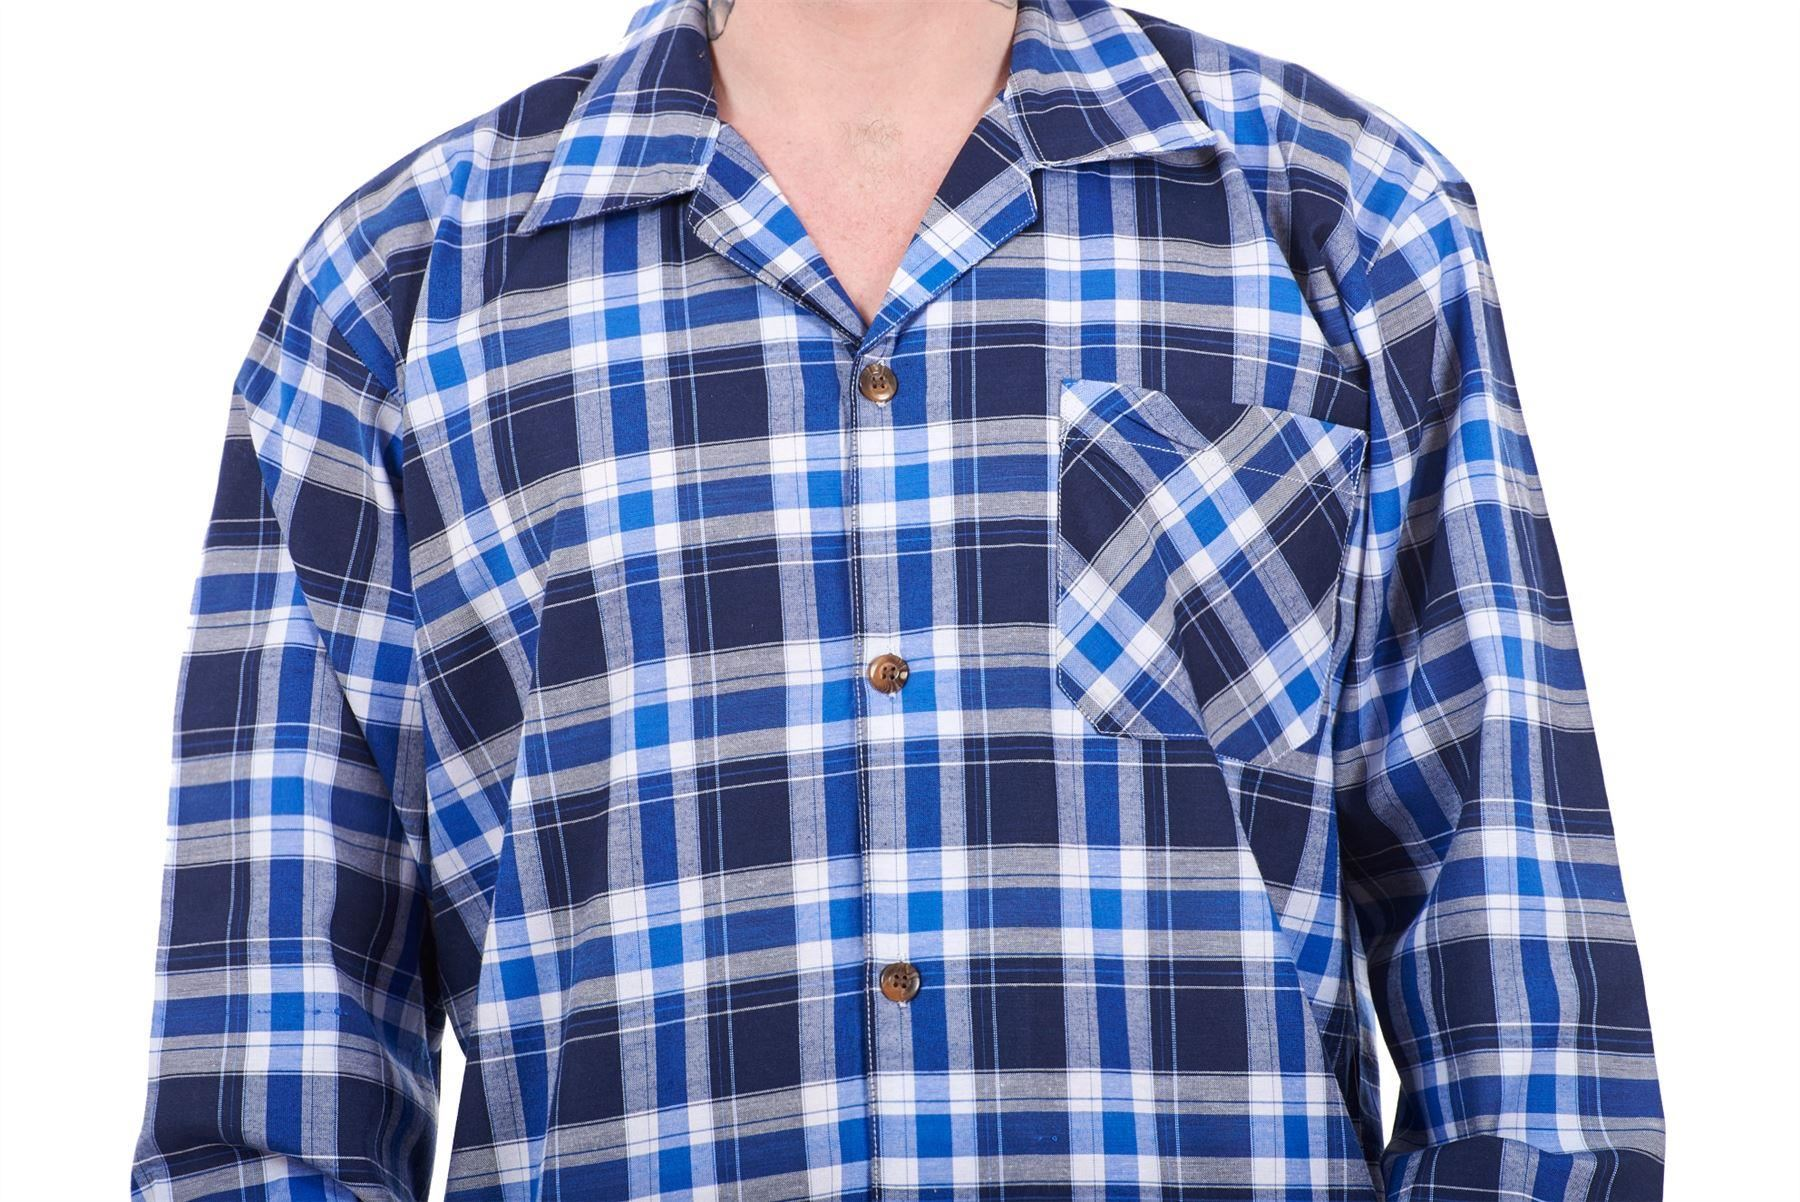 Mens Pyjama Set Yarn Dyed Woven Check Cotton Blend Loungewear Regular Big Size